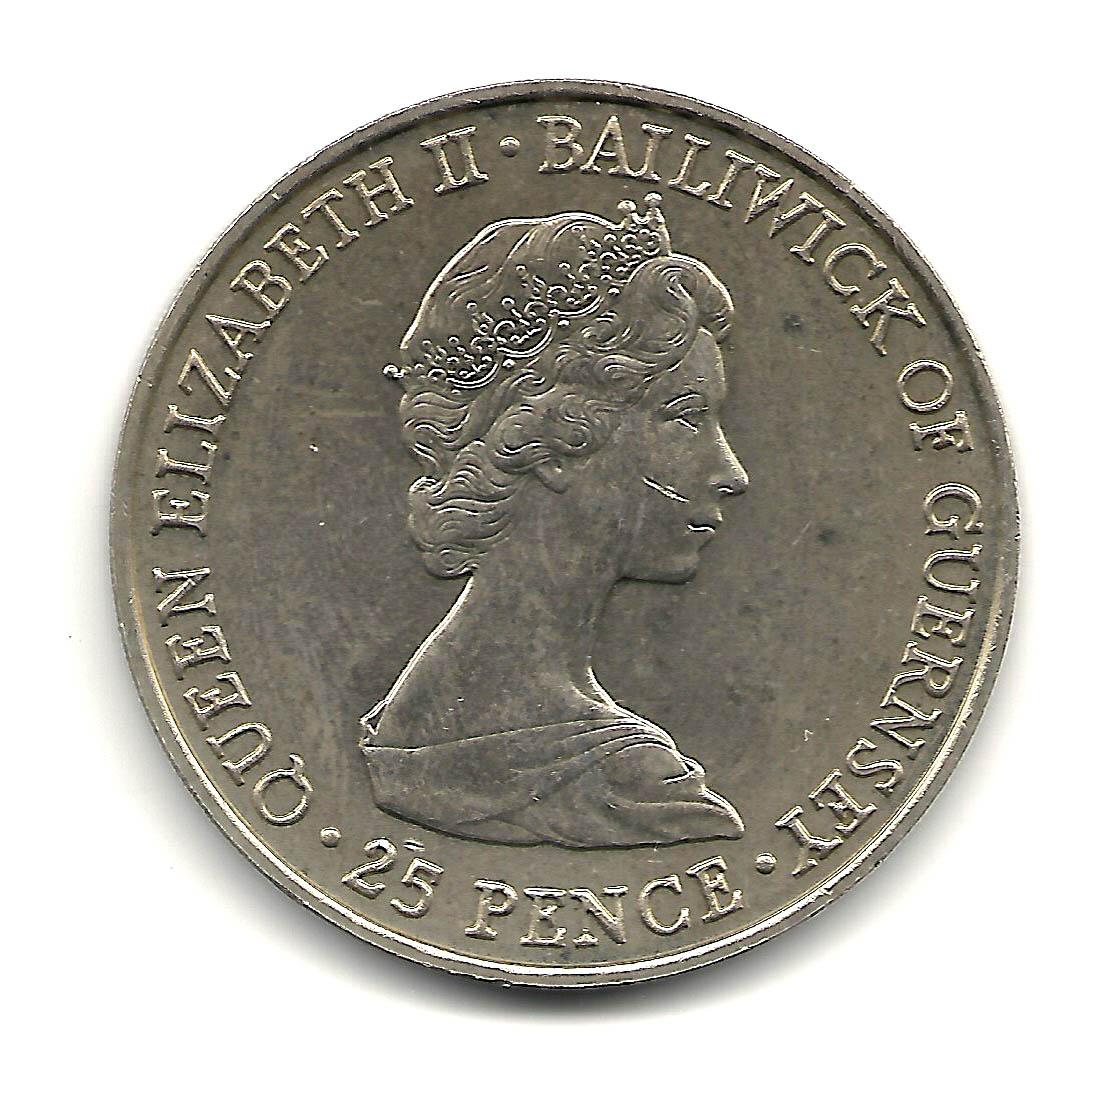 elizabeth ii bailiwick of guernsey coin